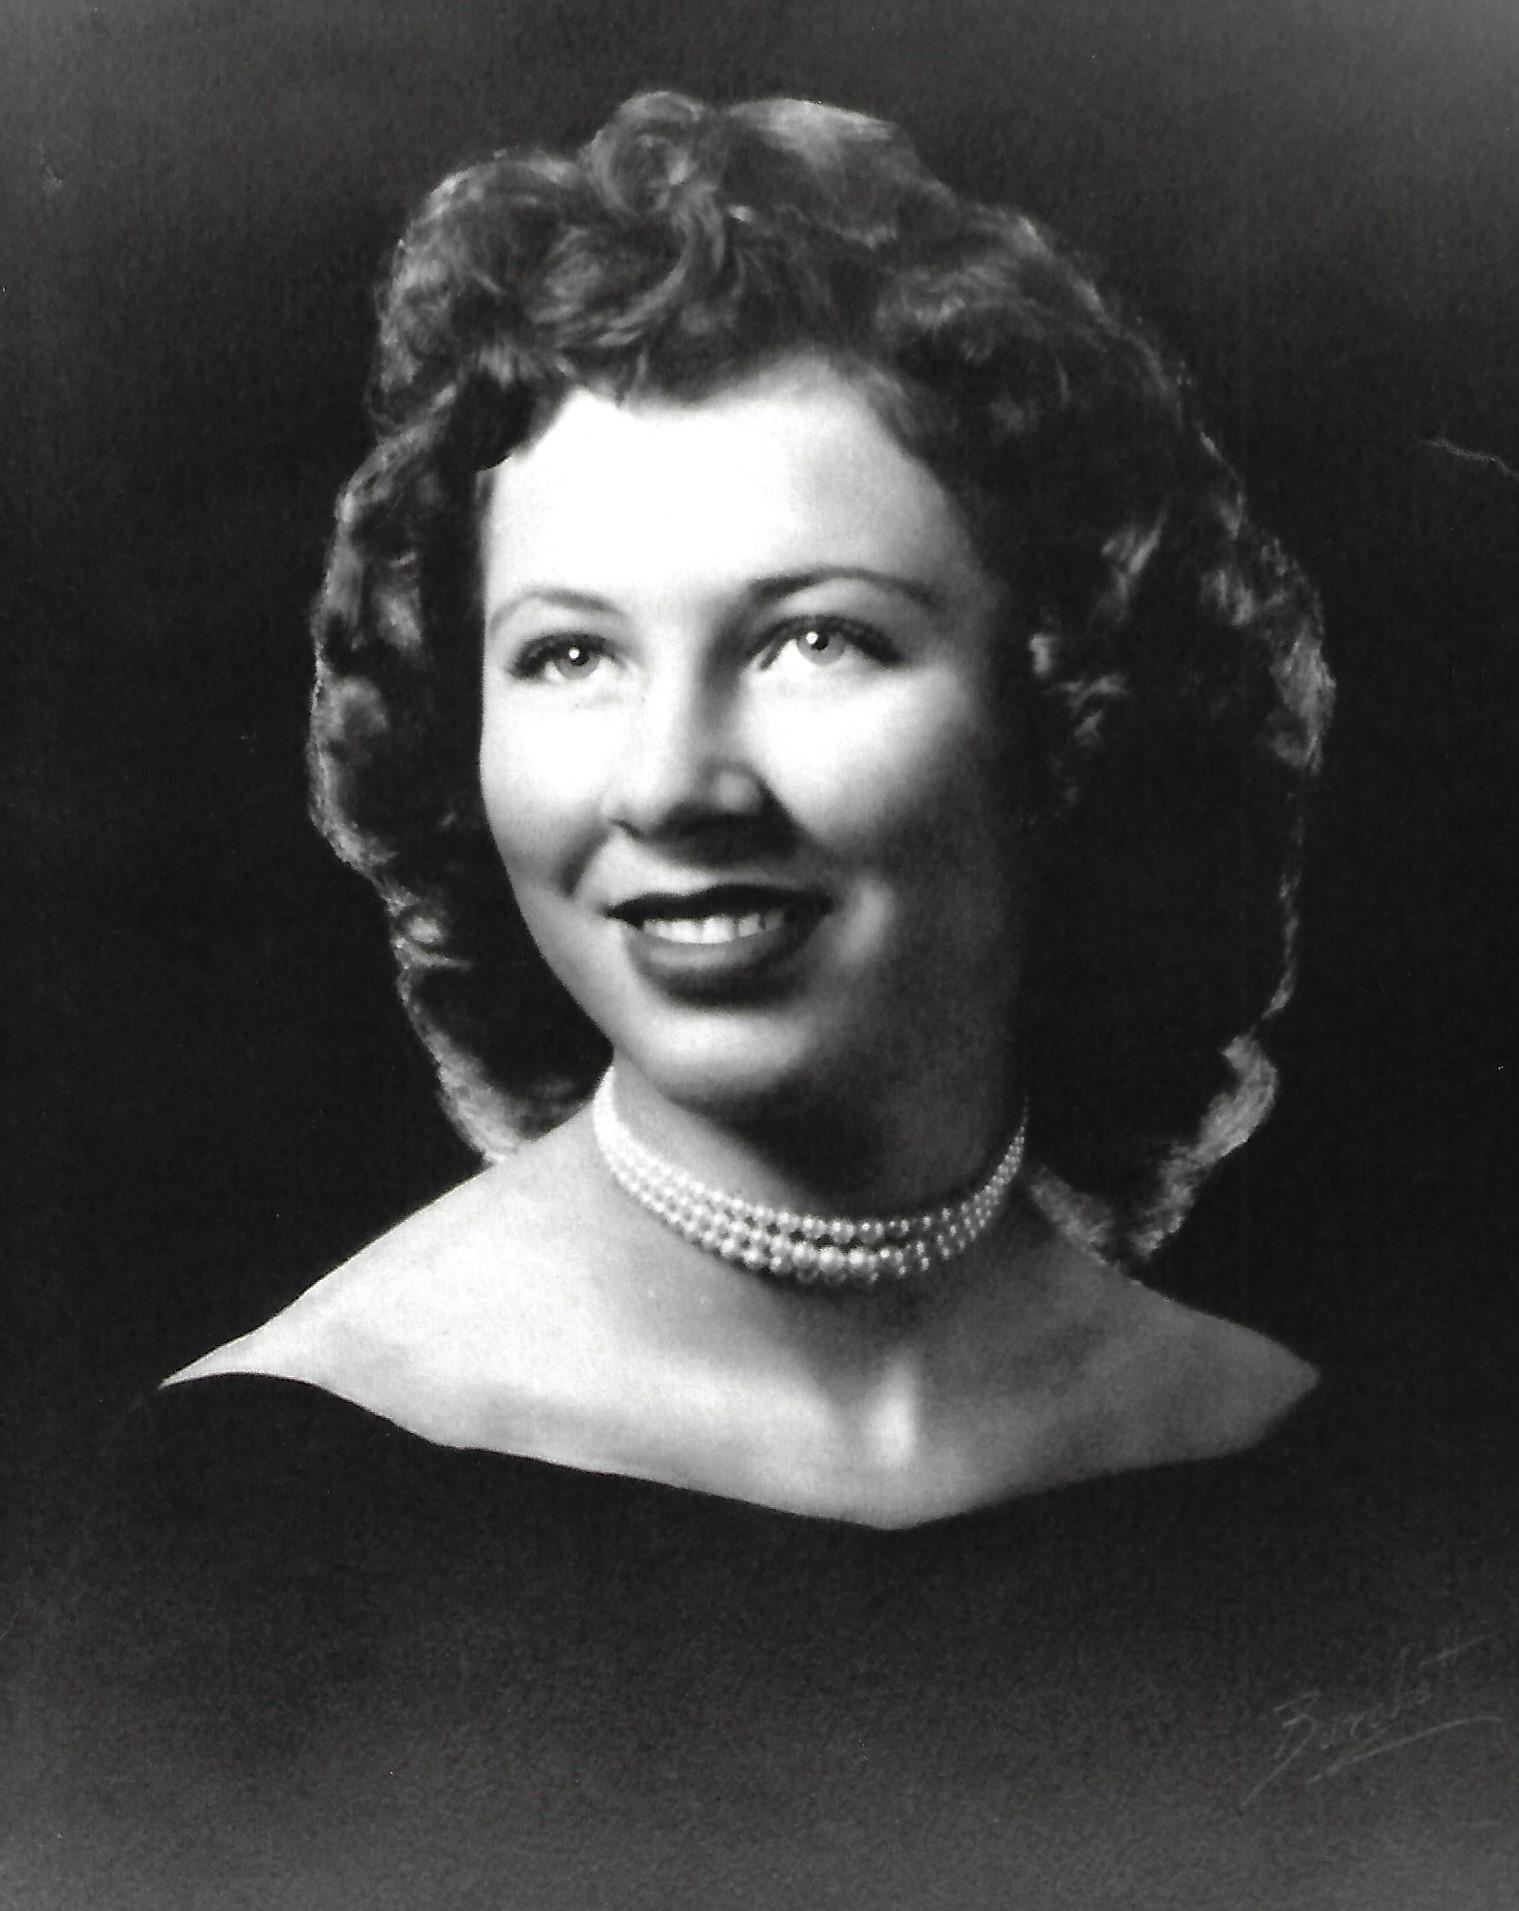 1953 Lincoln County Fair Queen